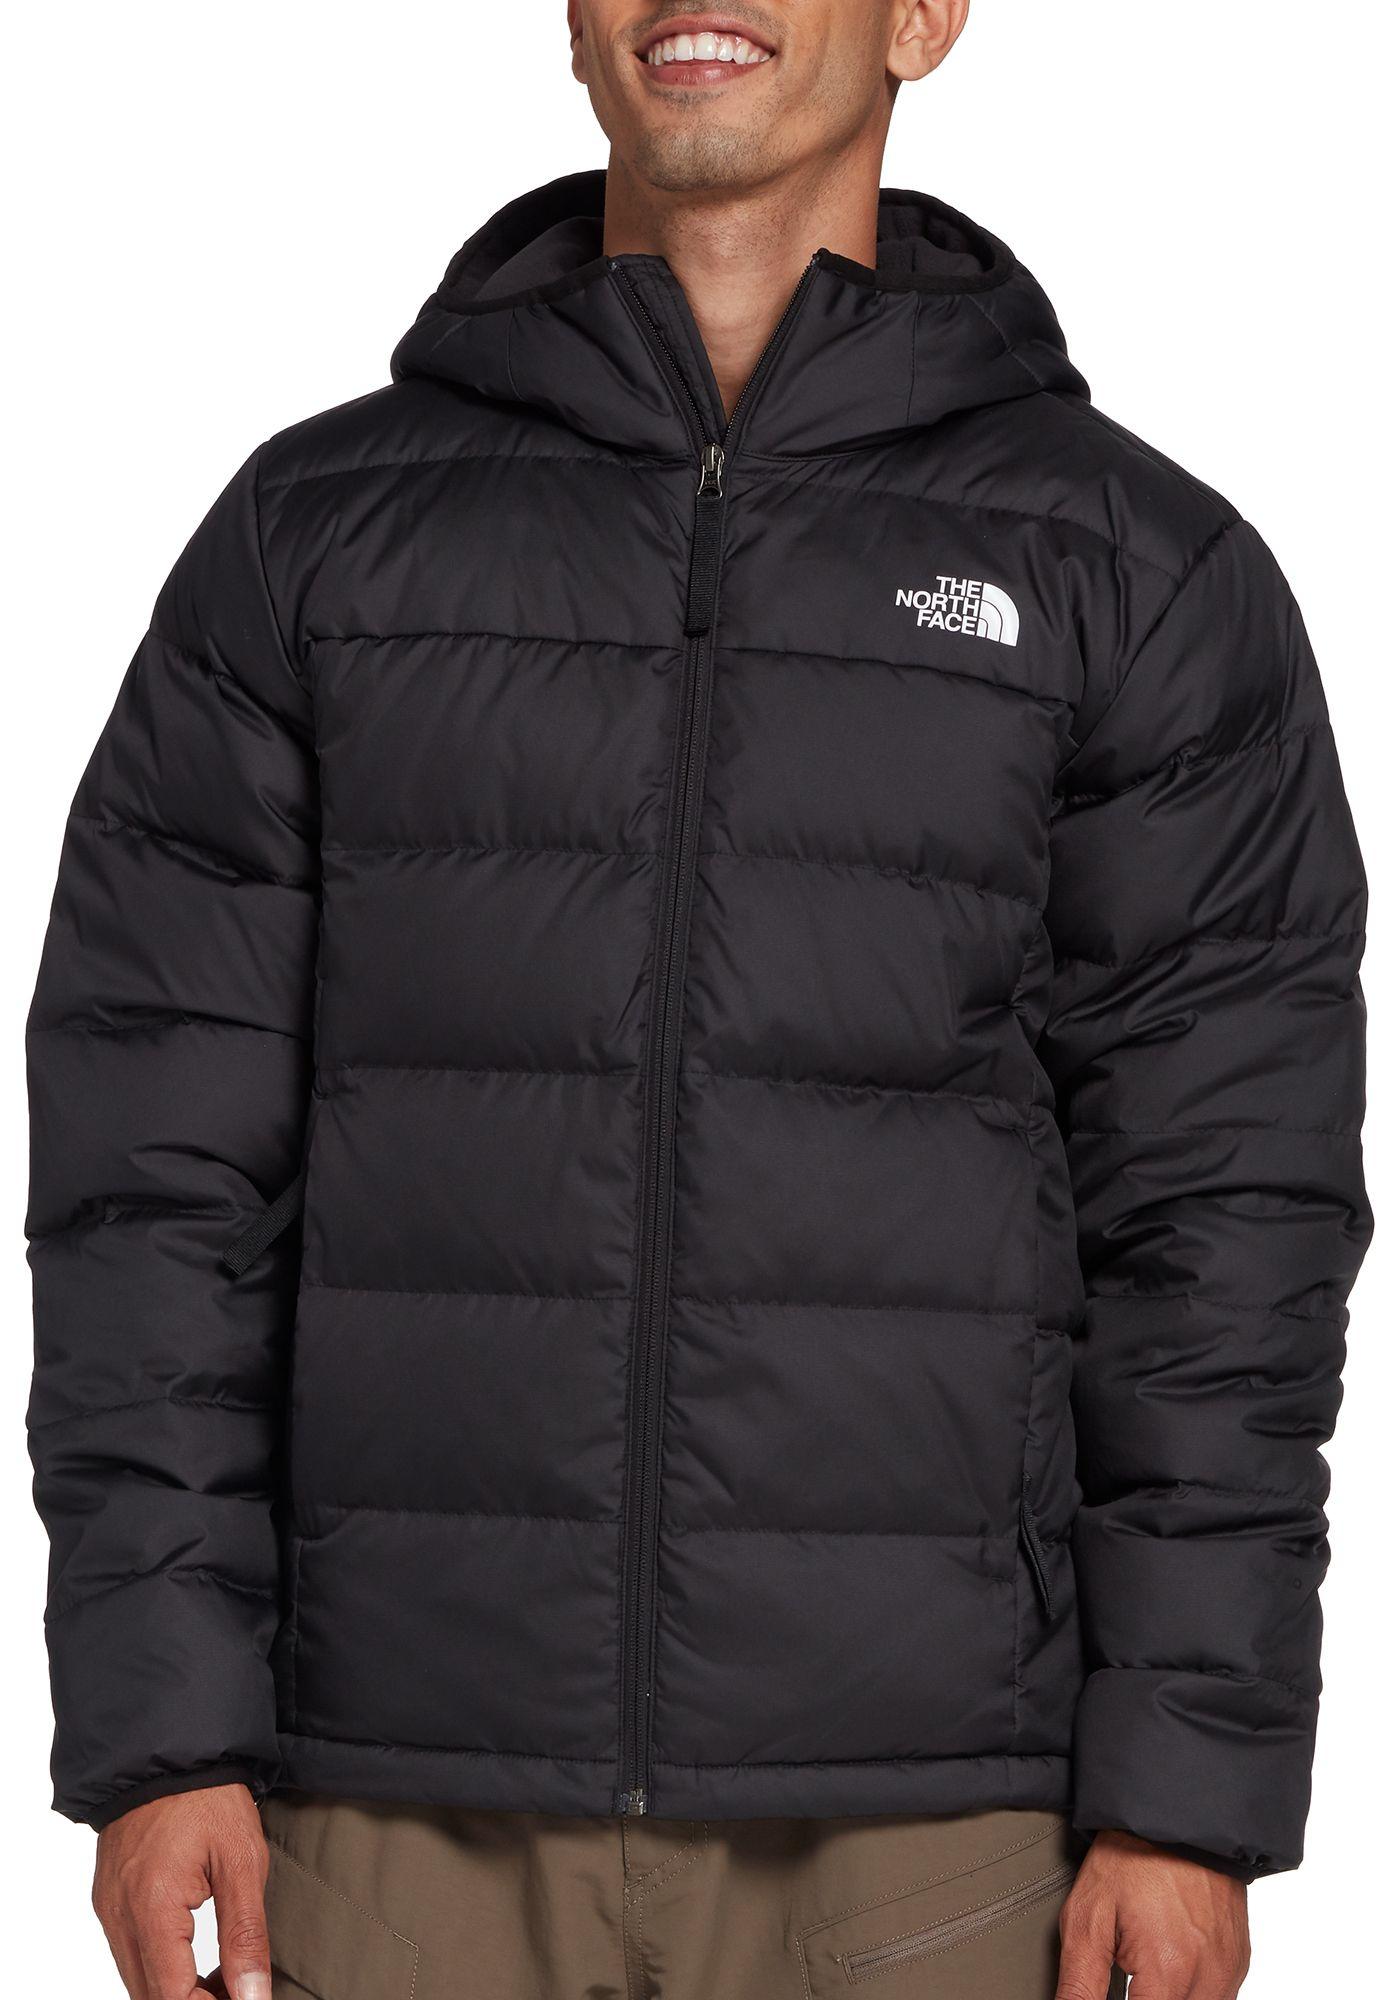 The North Face Men's Alpz Luxe Winter Jacket